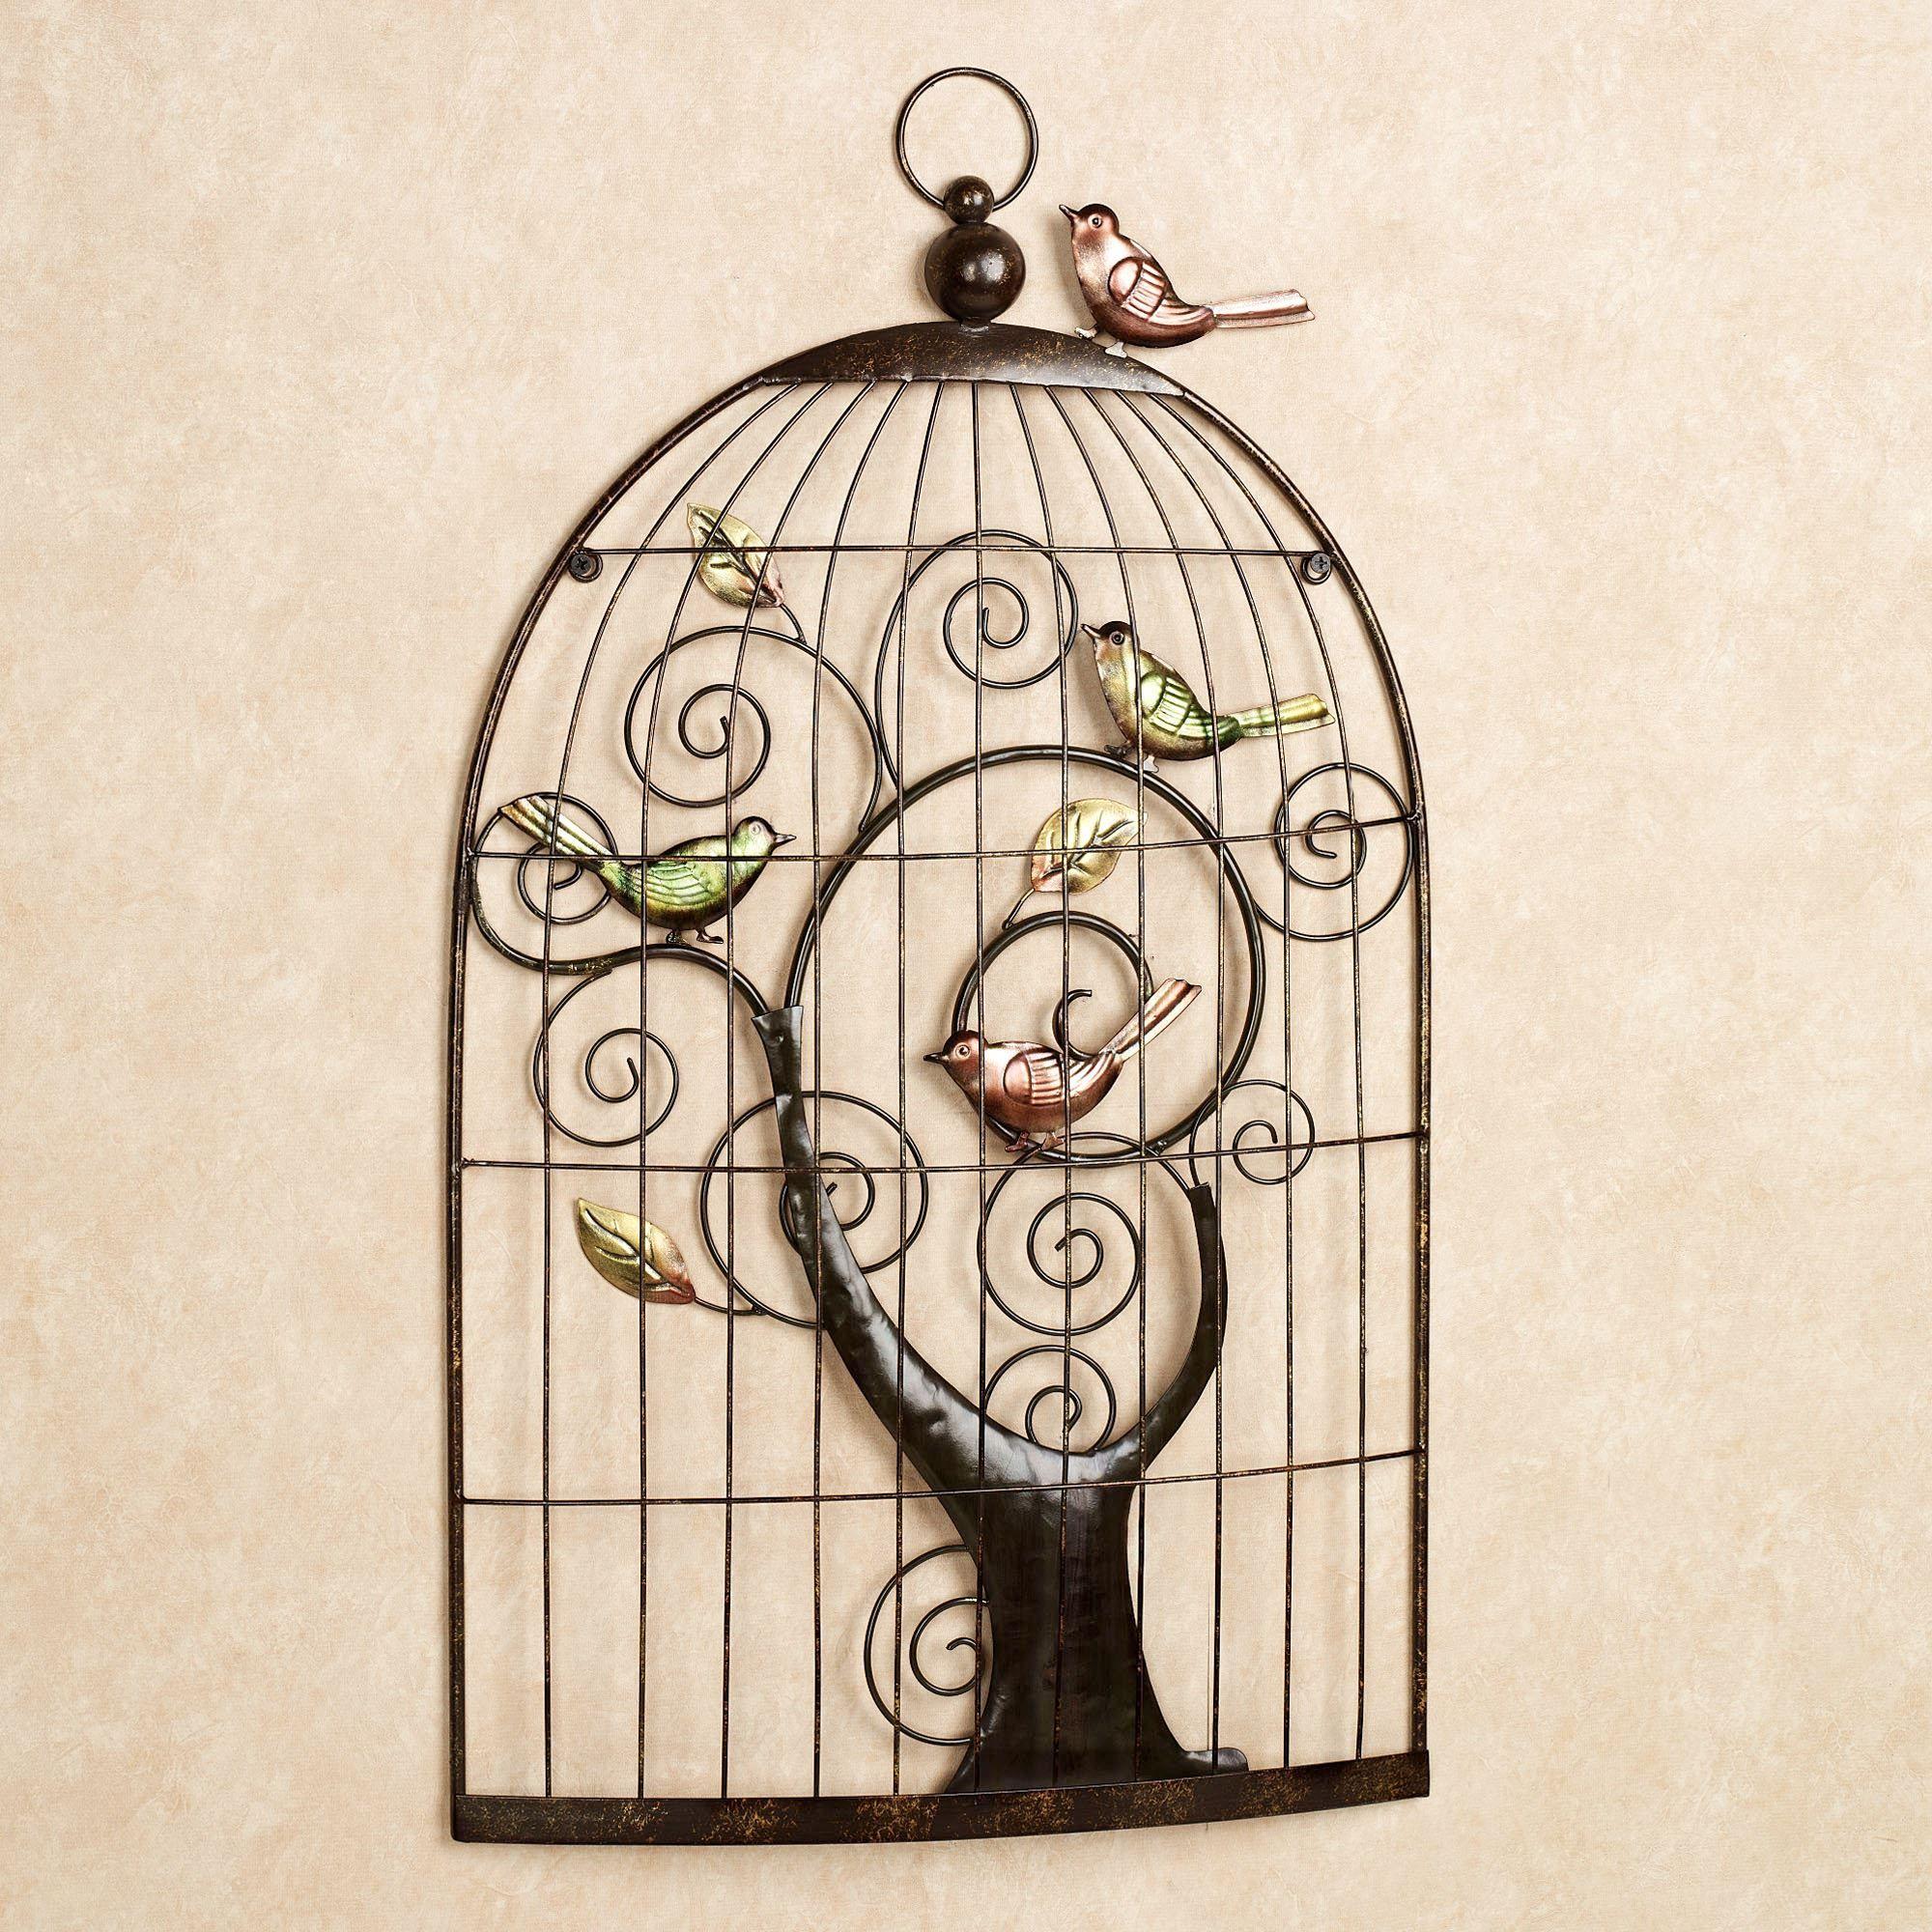 Enchanting Sonnet Birdcage Metal Wall Art